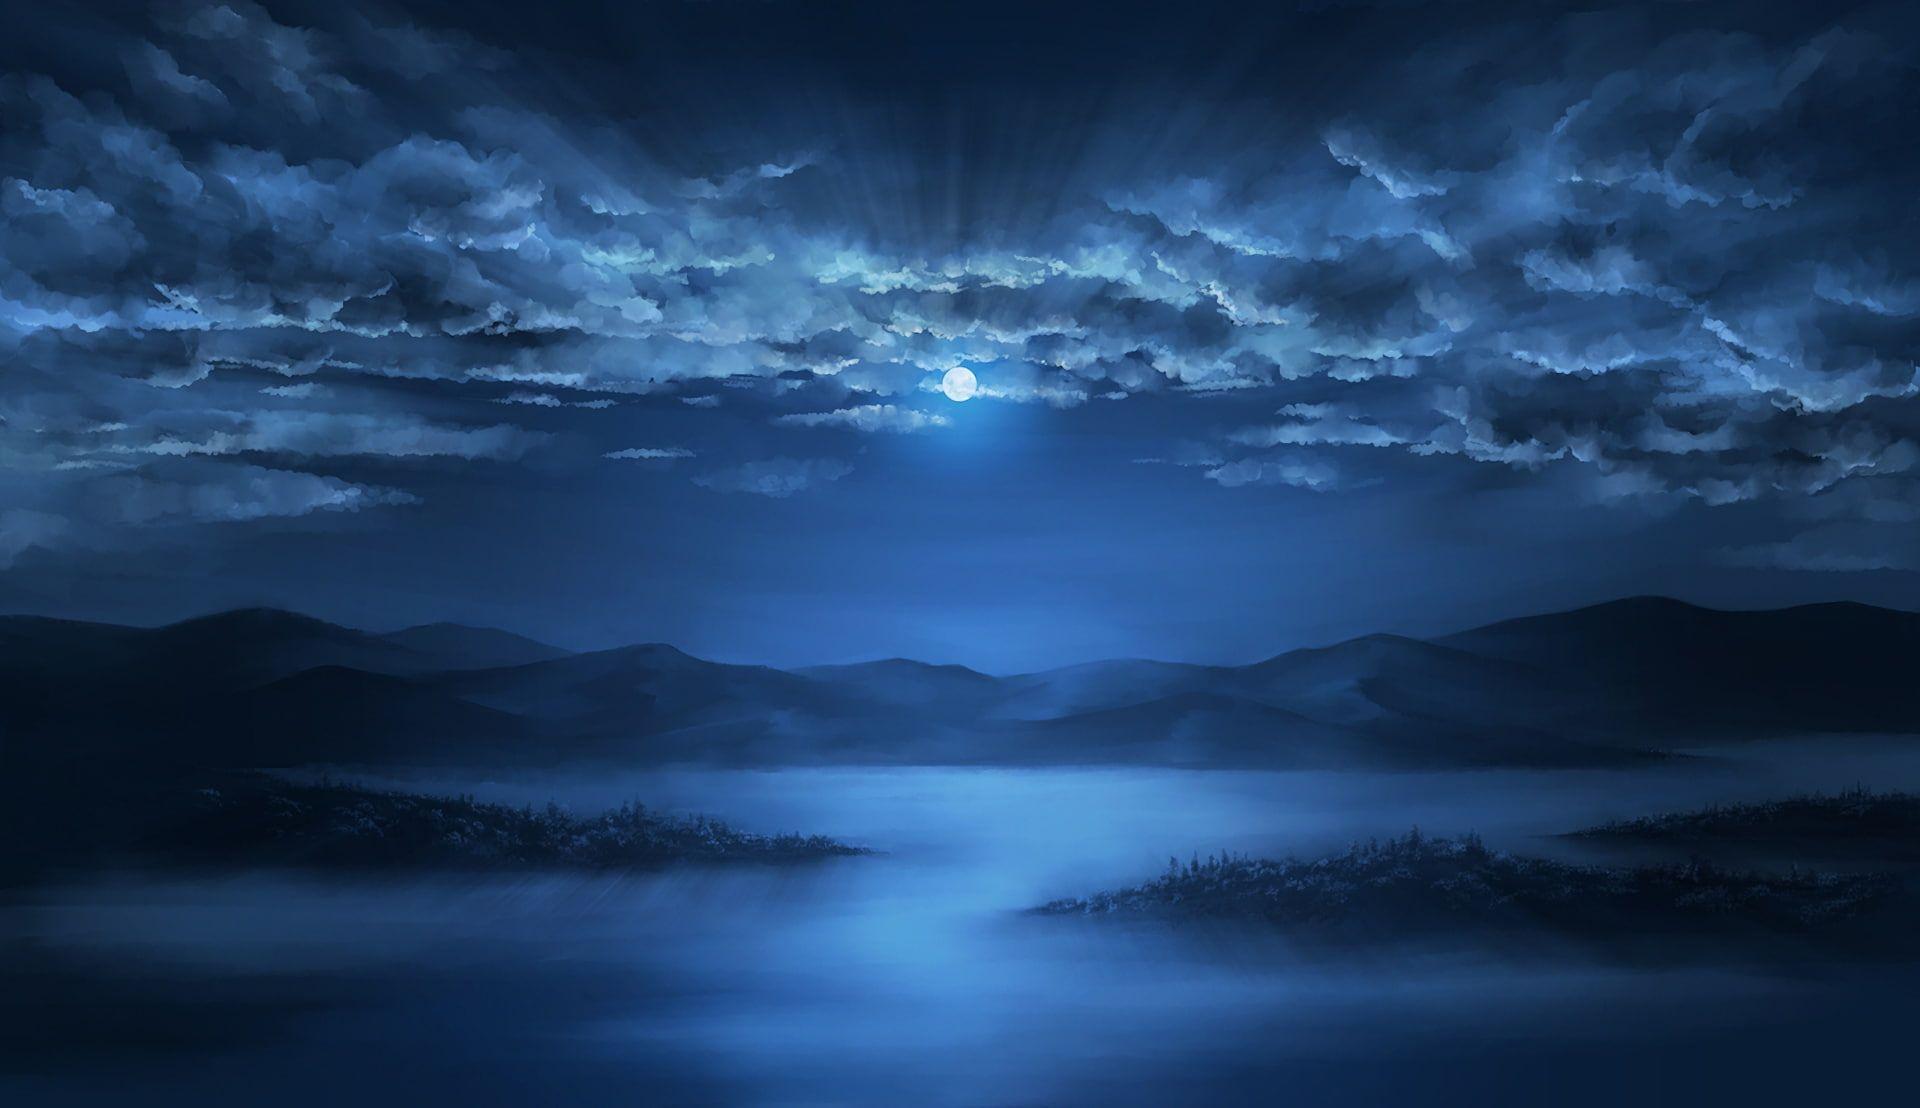 Anime Landscape Night Moon Clouds Sky Lake Artwork Anime 1080p Wallpaper Hdwallpaper Desktop Lake Artwork Anime Scenery Scenery Background